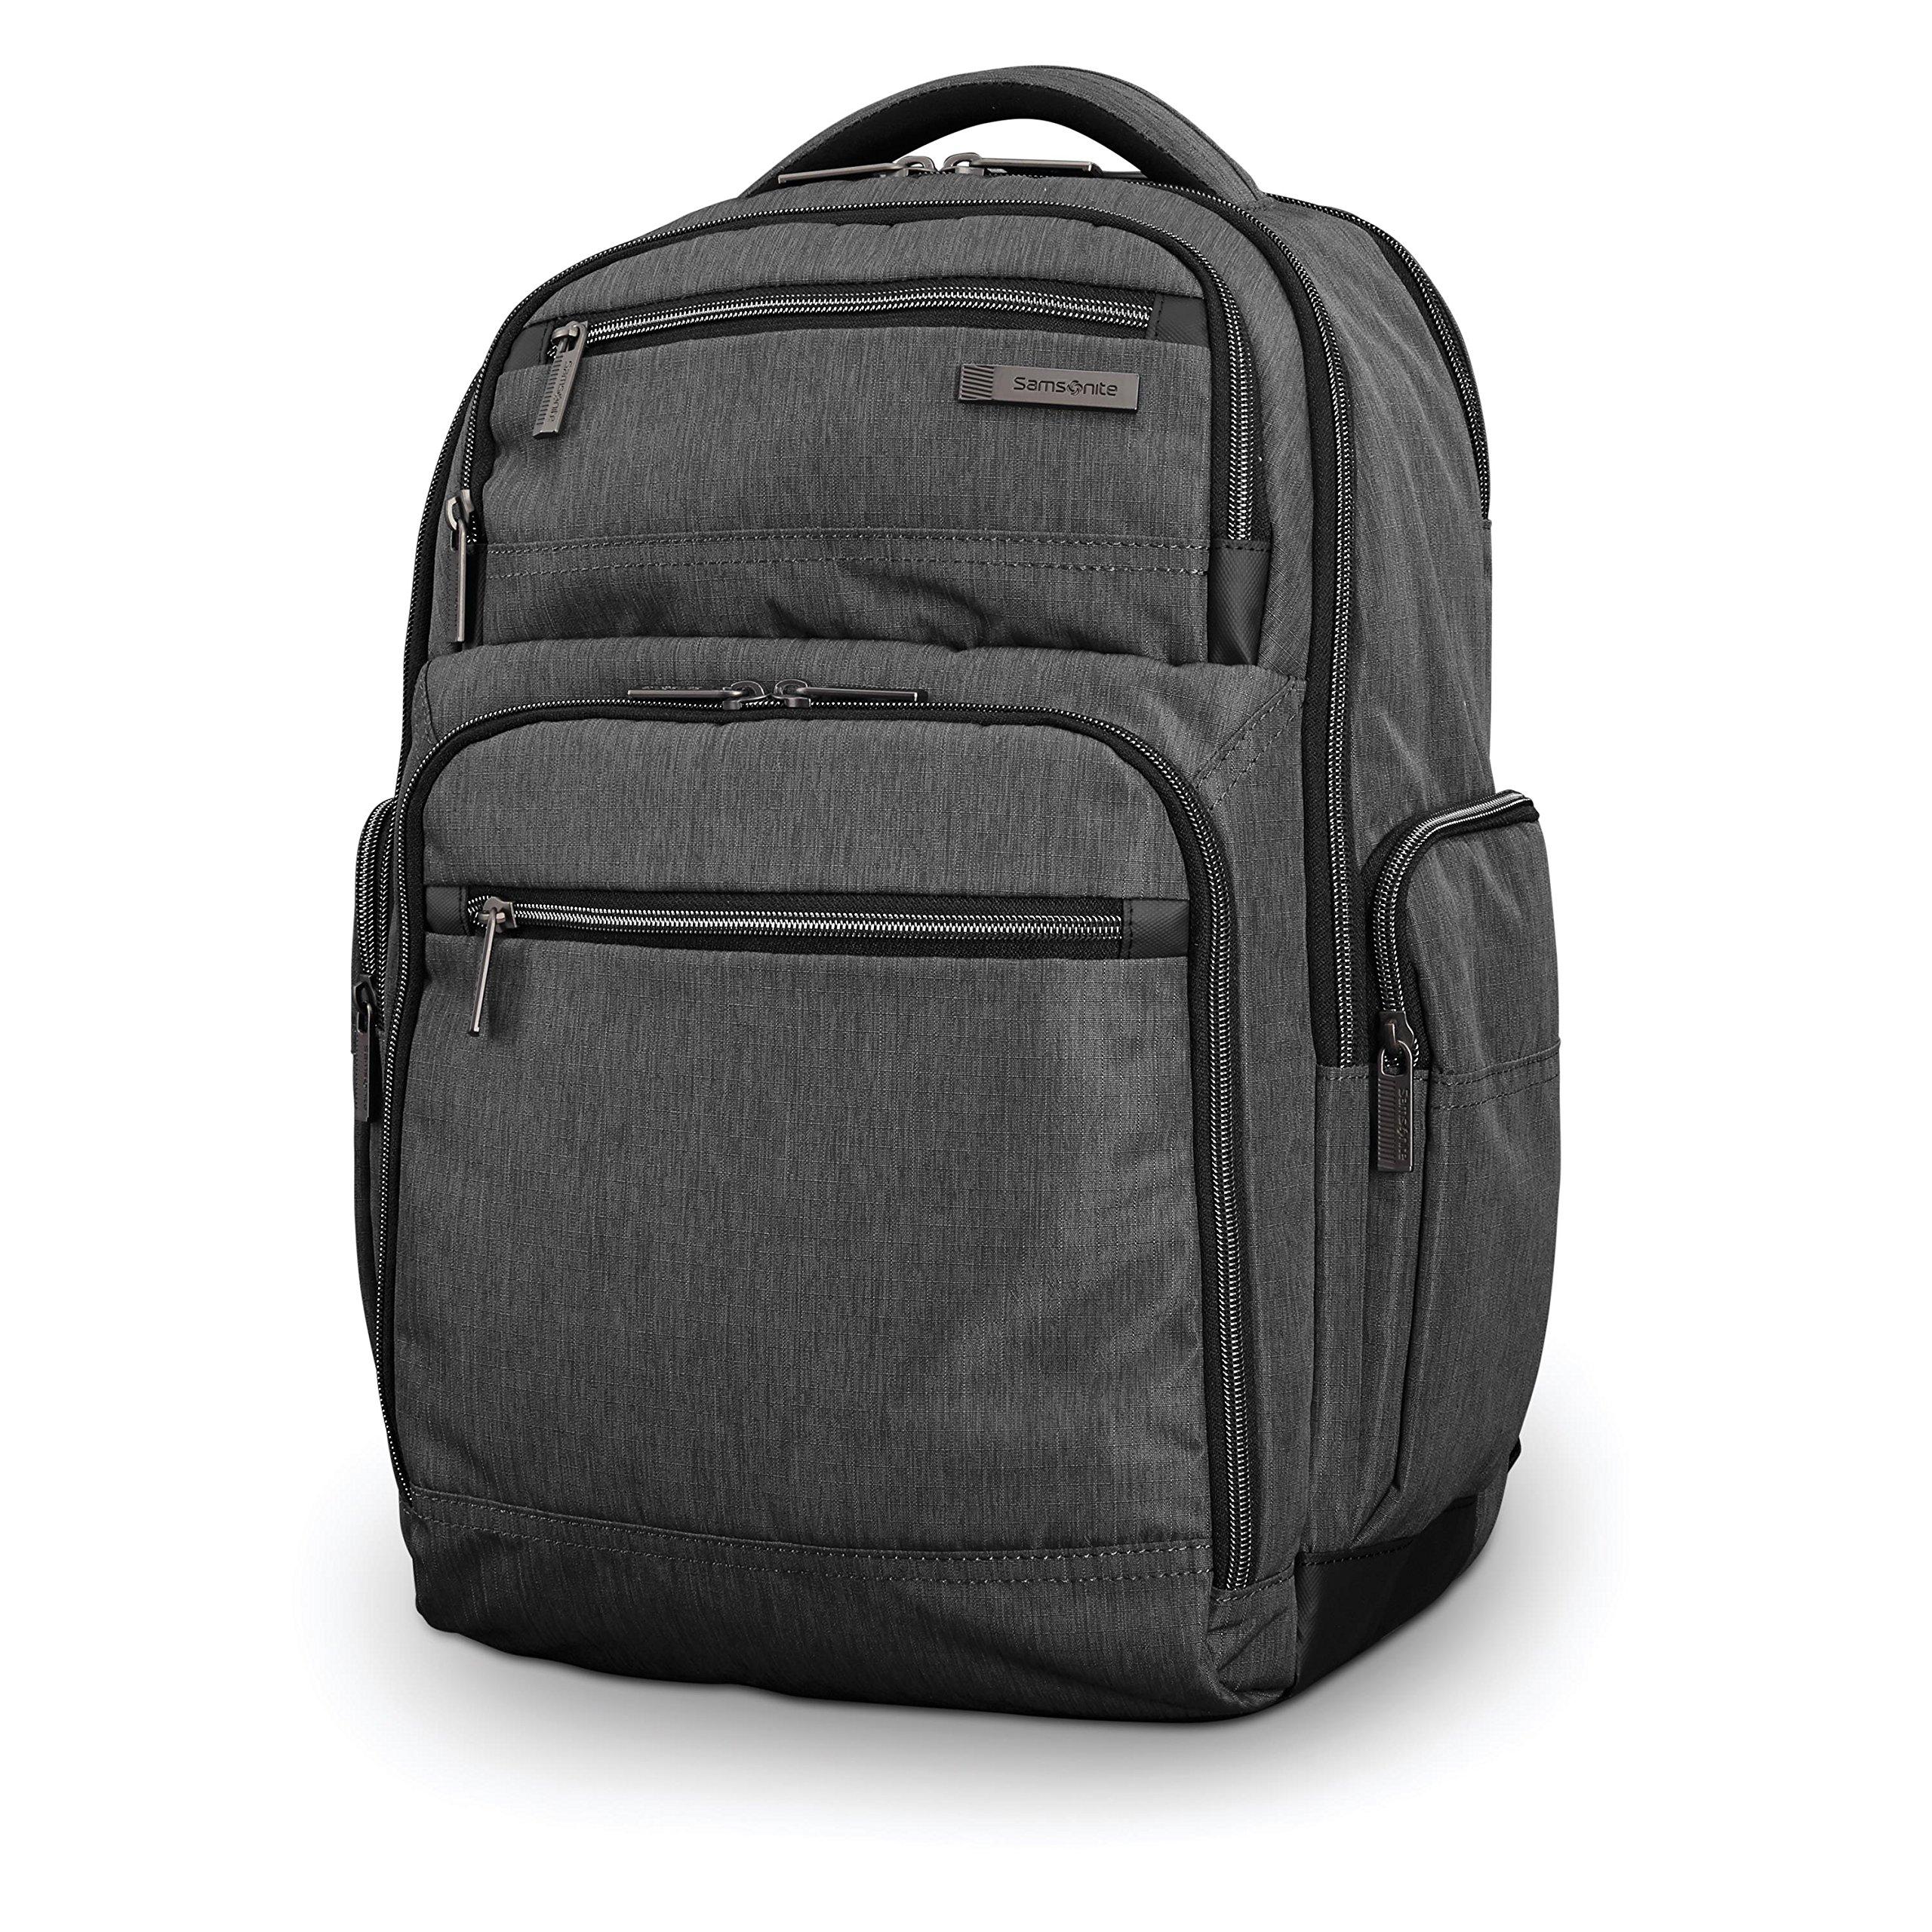 Samsonite 新秀丽 现代多功能双击笔记本电脑背包